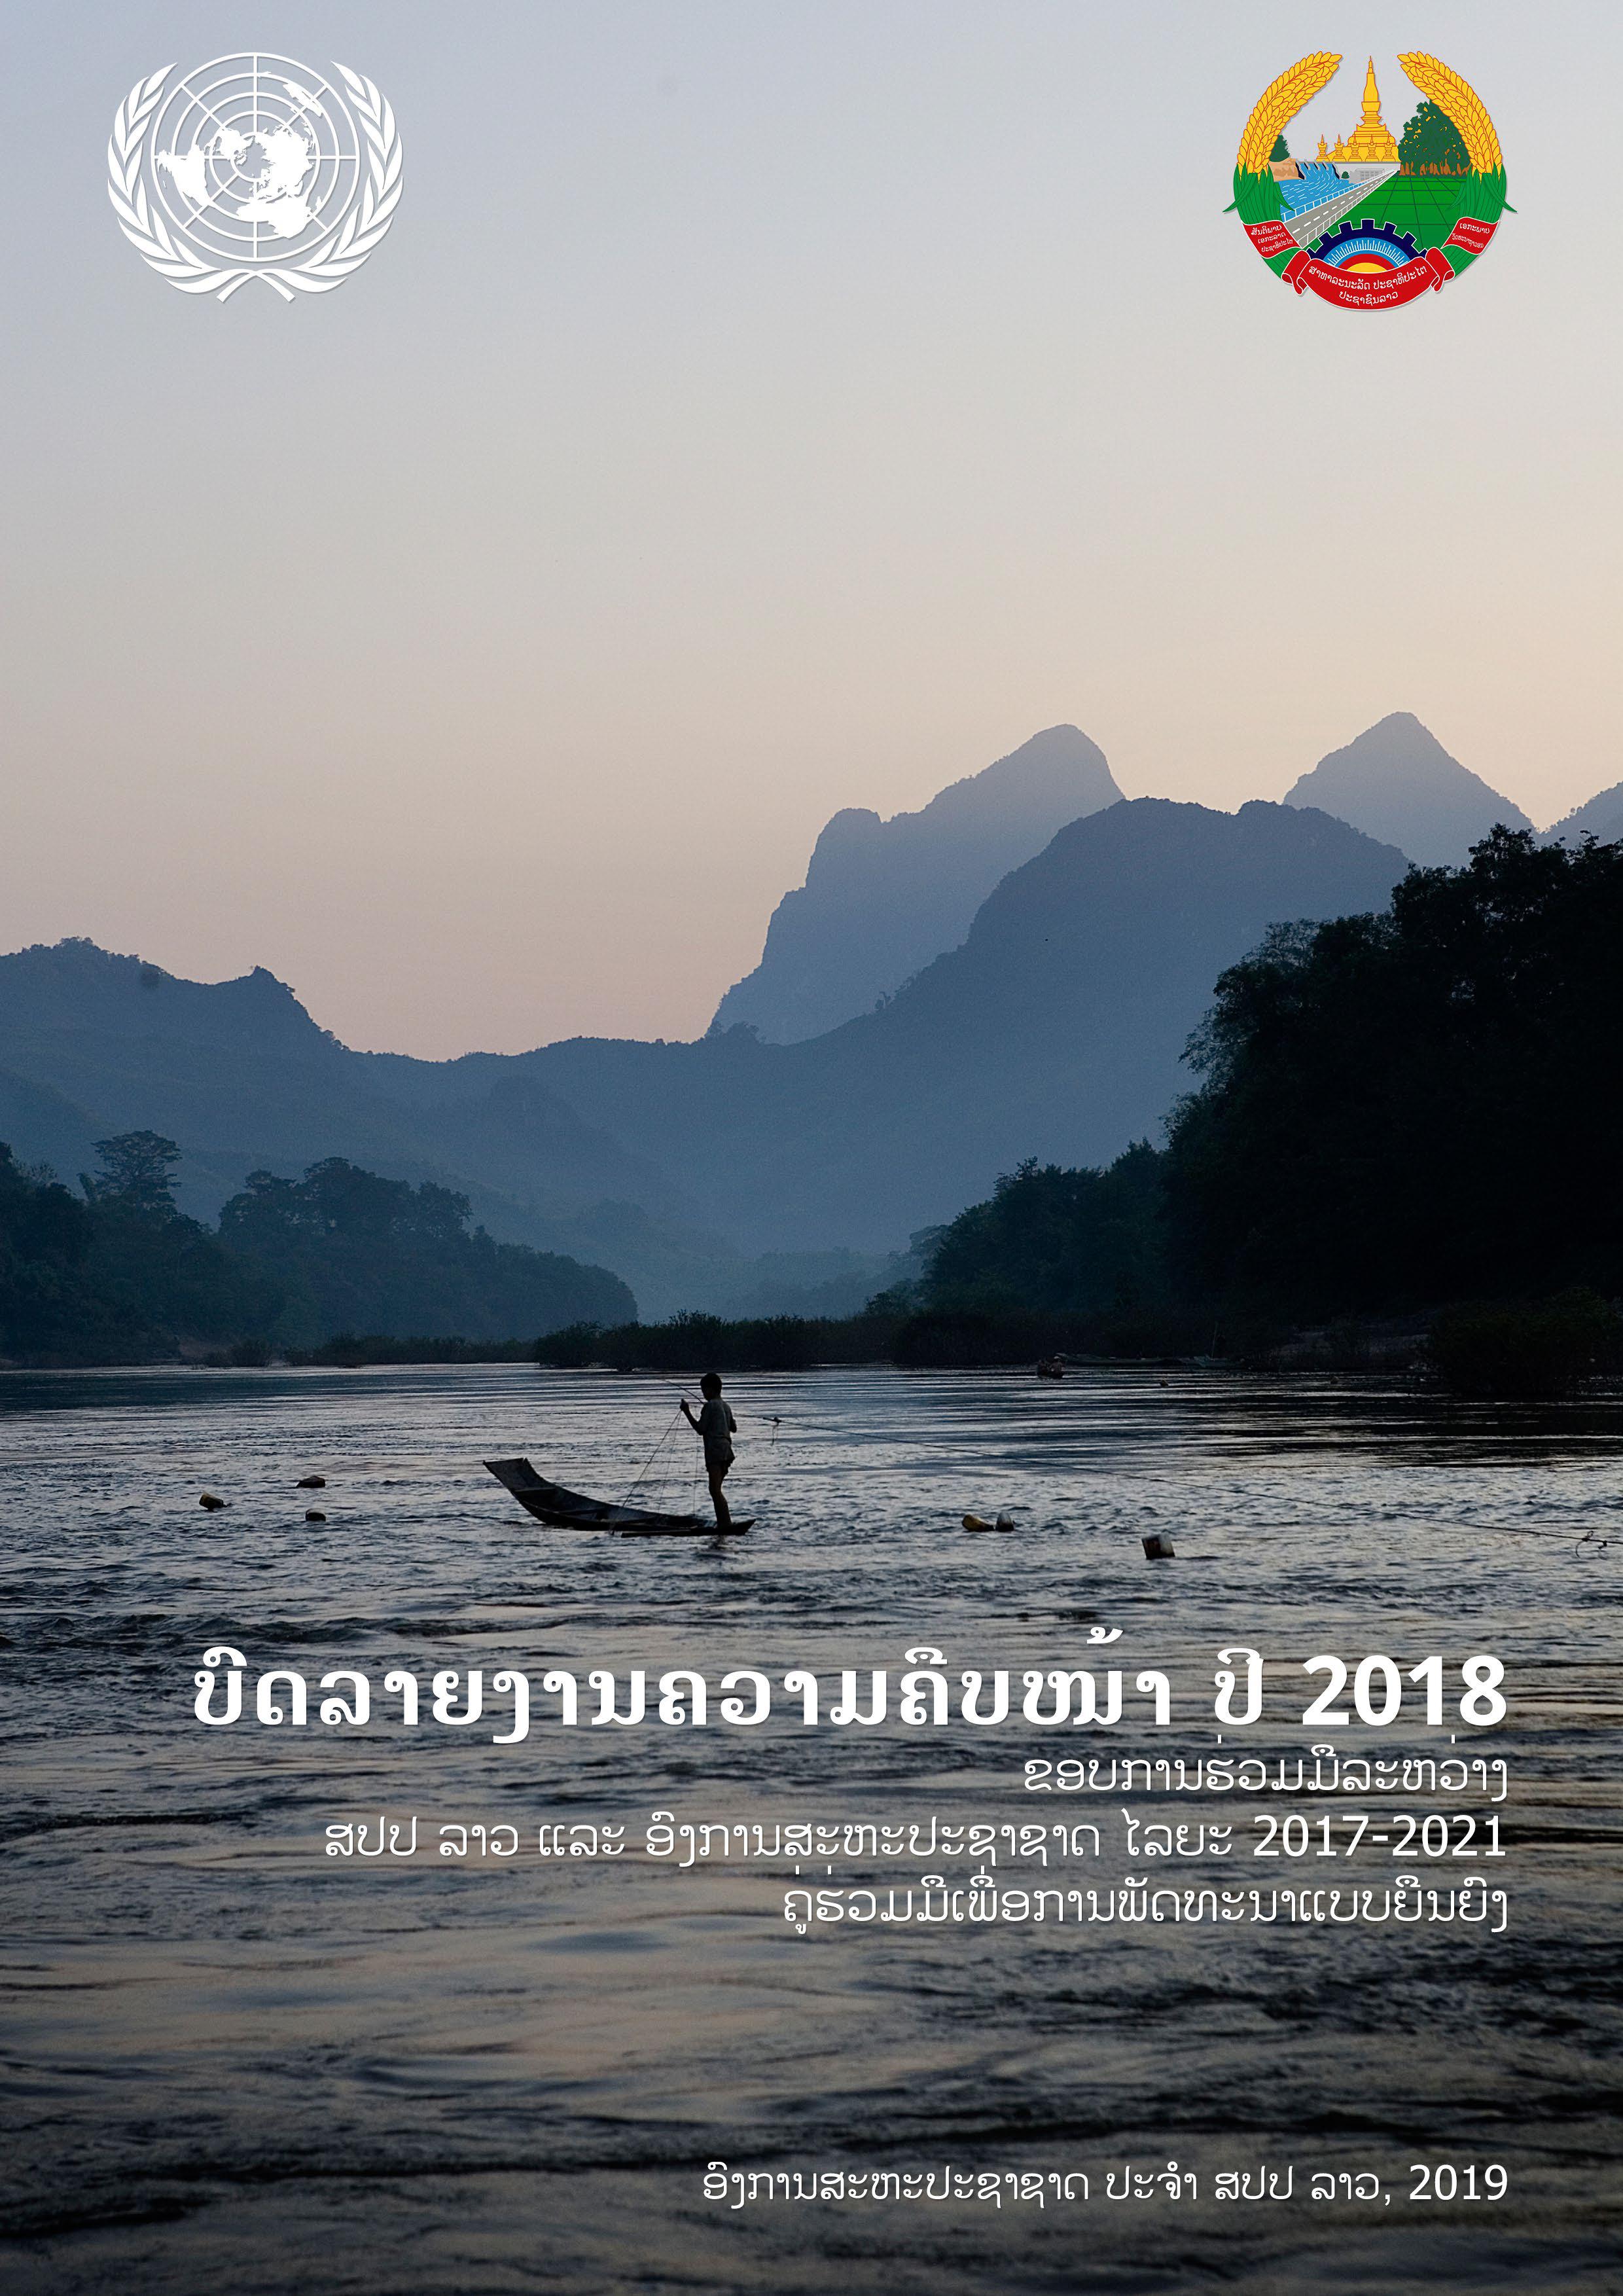 Lao PDR – United Nations Partnership Framework for Sustainable Development (2017-2021): 2018 Progress Report